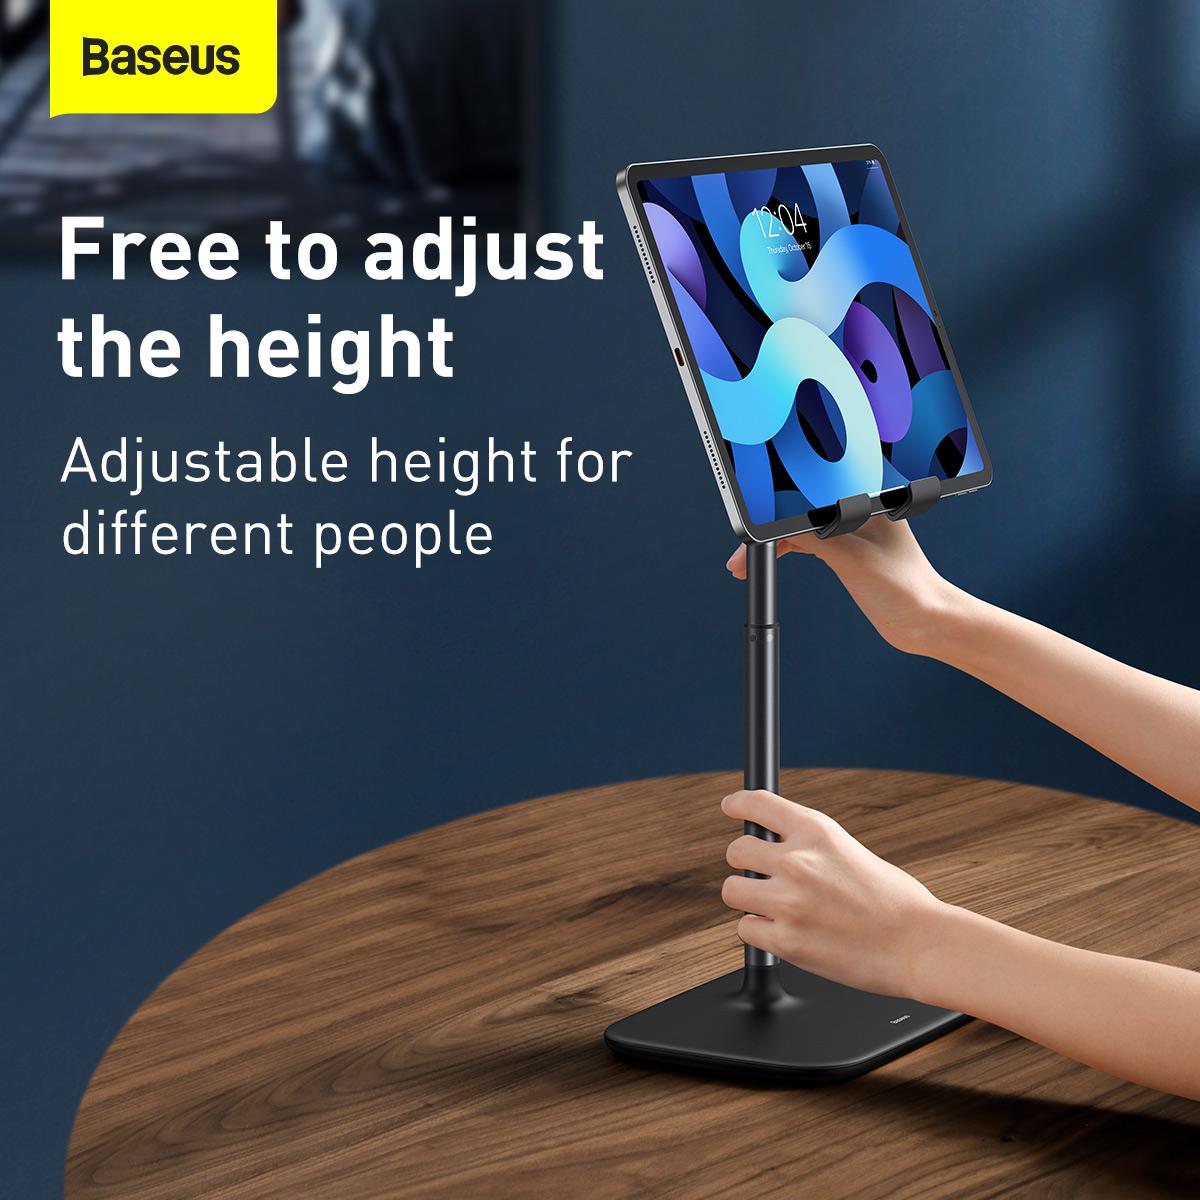 Baseus Universal Telescopic Version Multi-Angle Adjustment Mobile Phone Tablet Desktop Holder Stand for iPhone 12 POCO X3